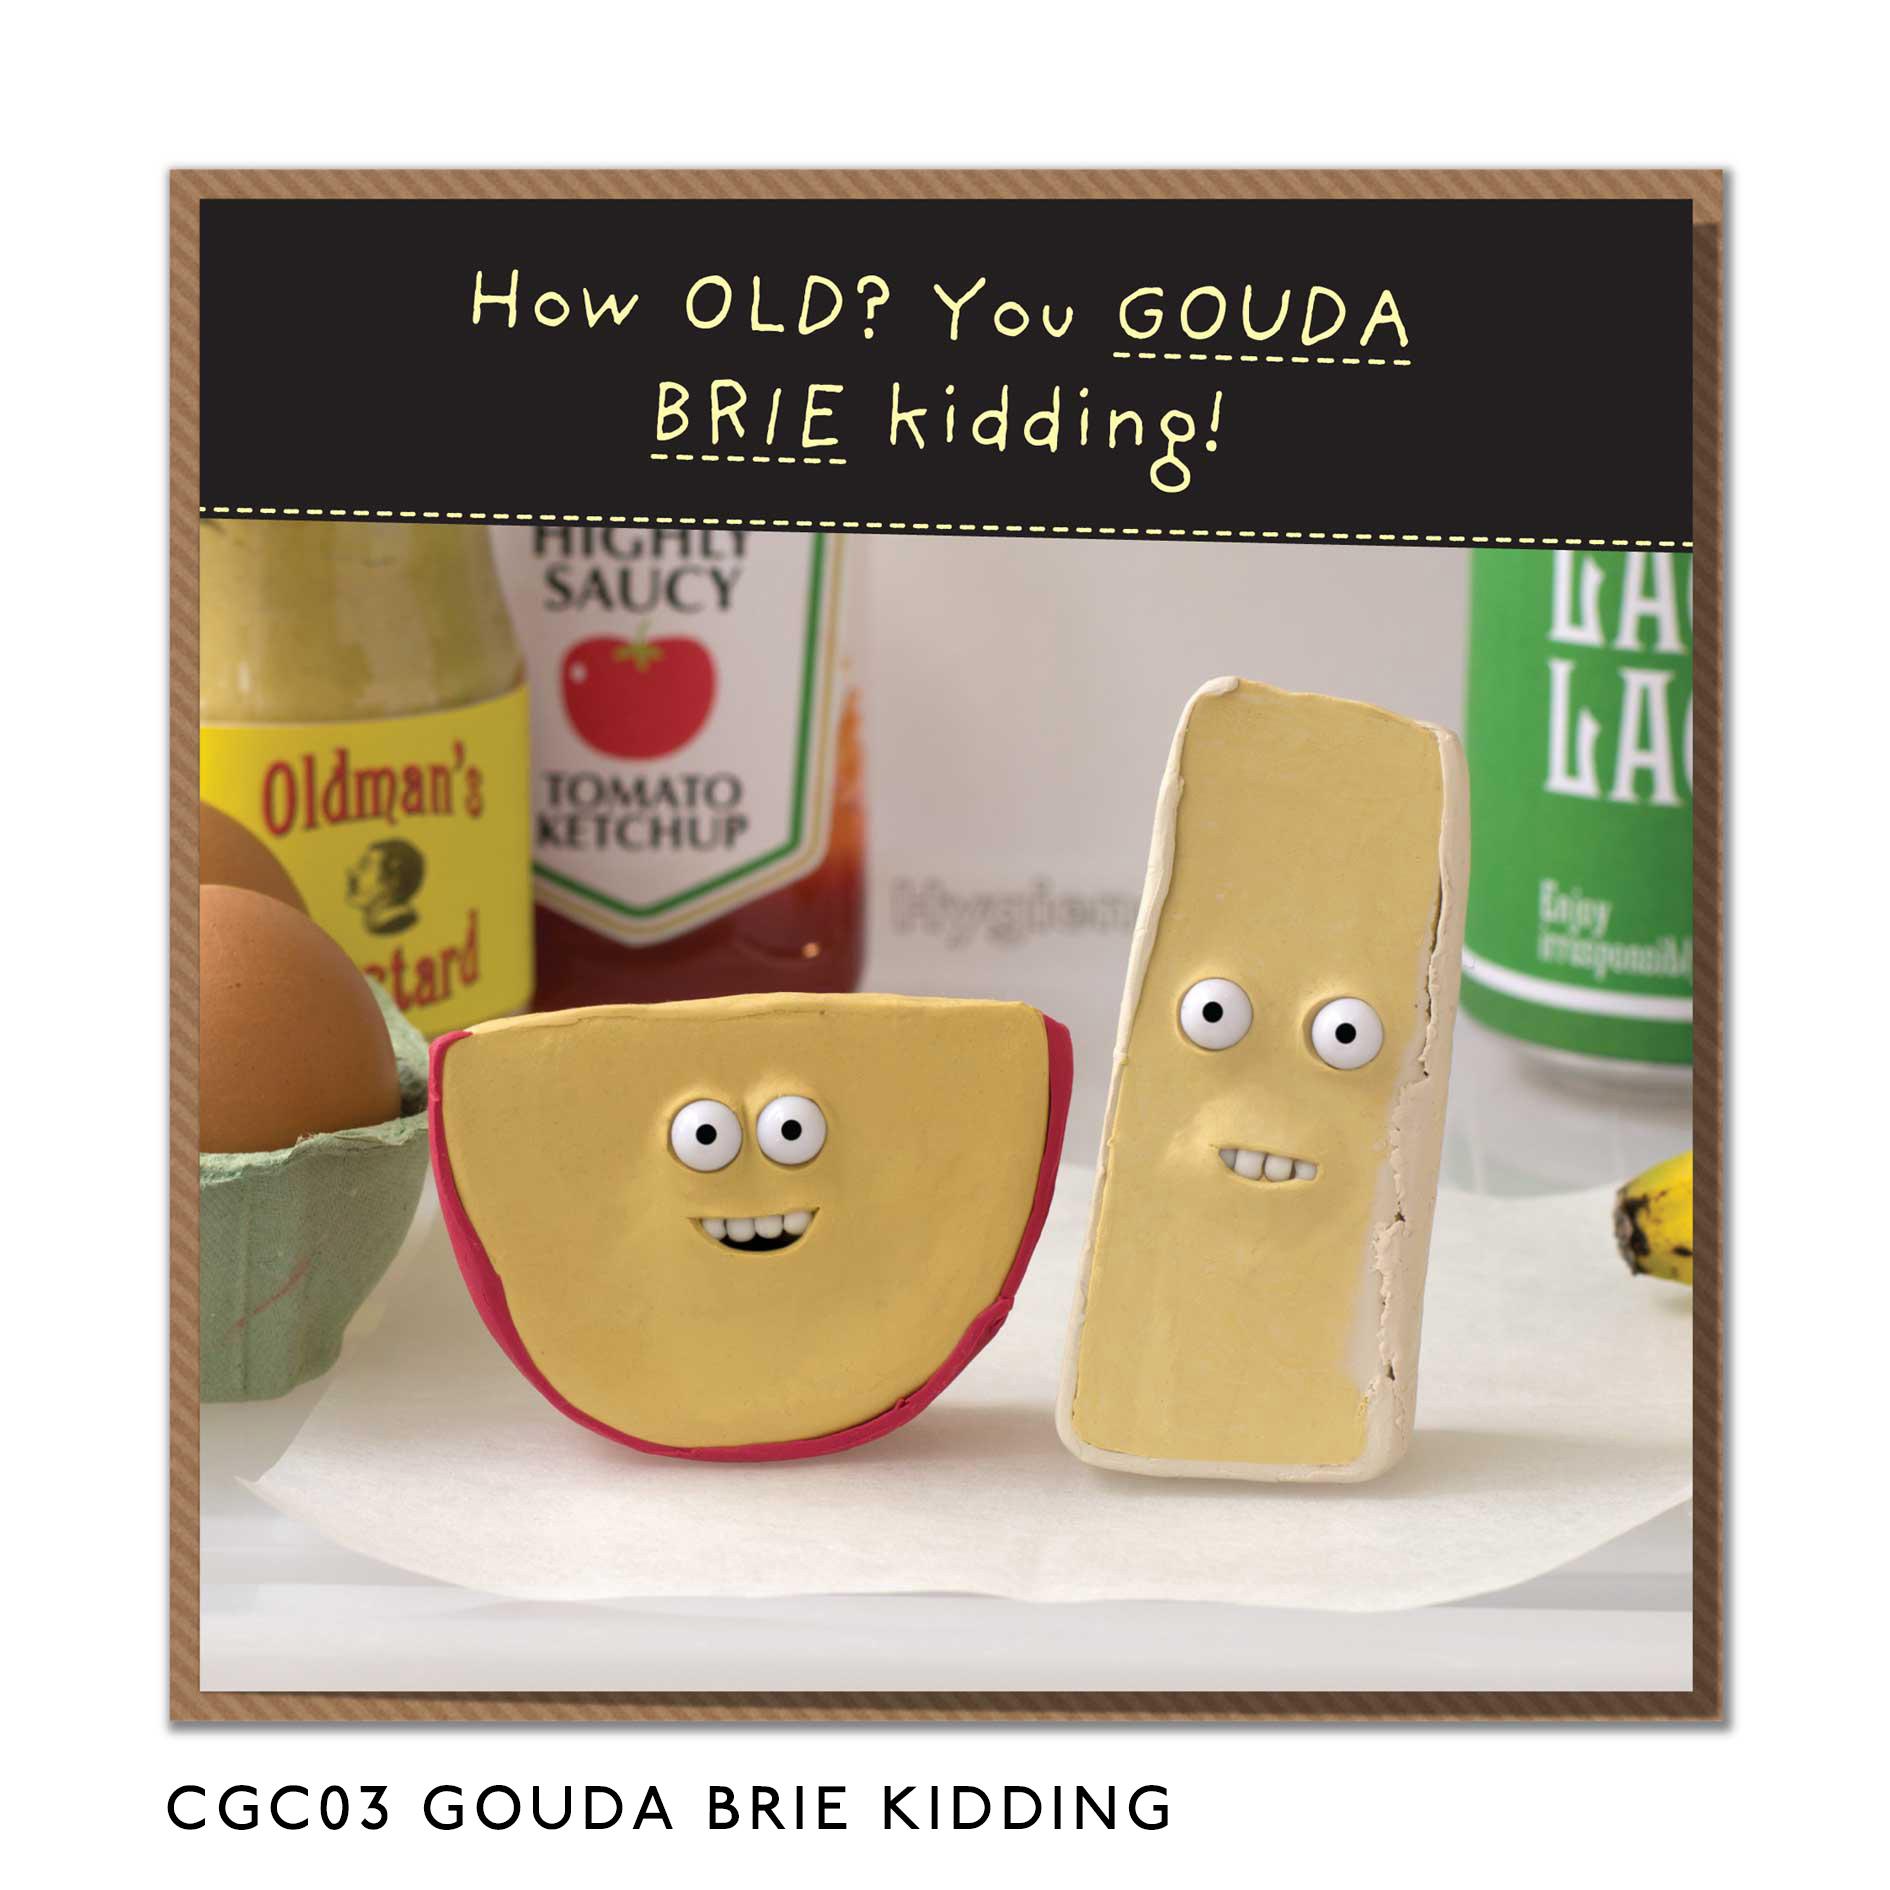 CGC03-GOUDA-BRIE-KIDDING.jpg